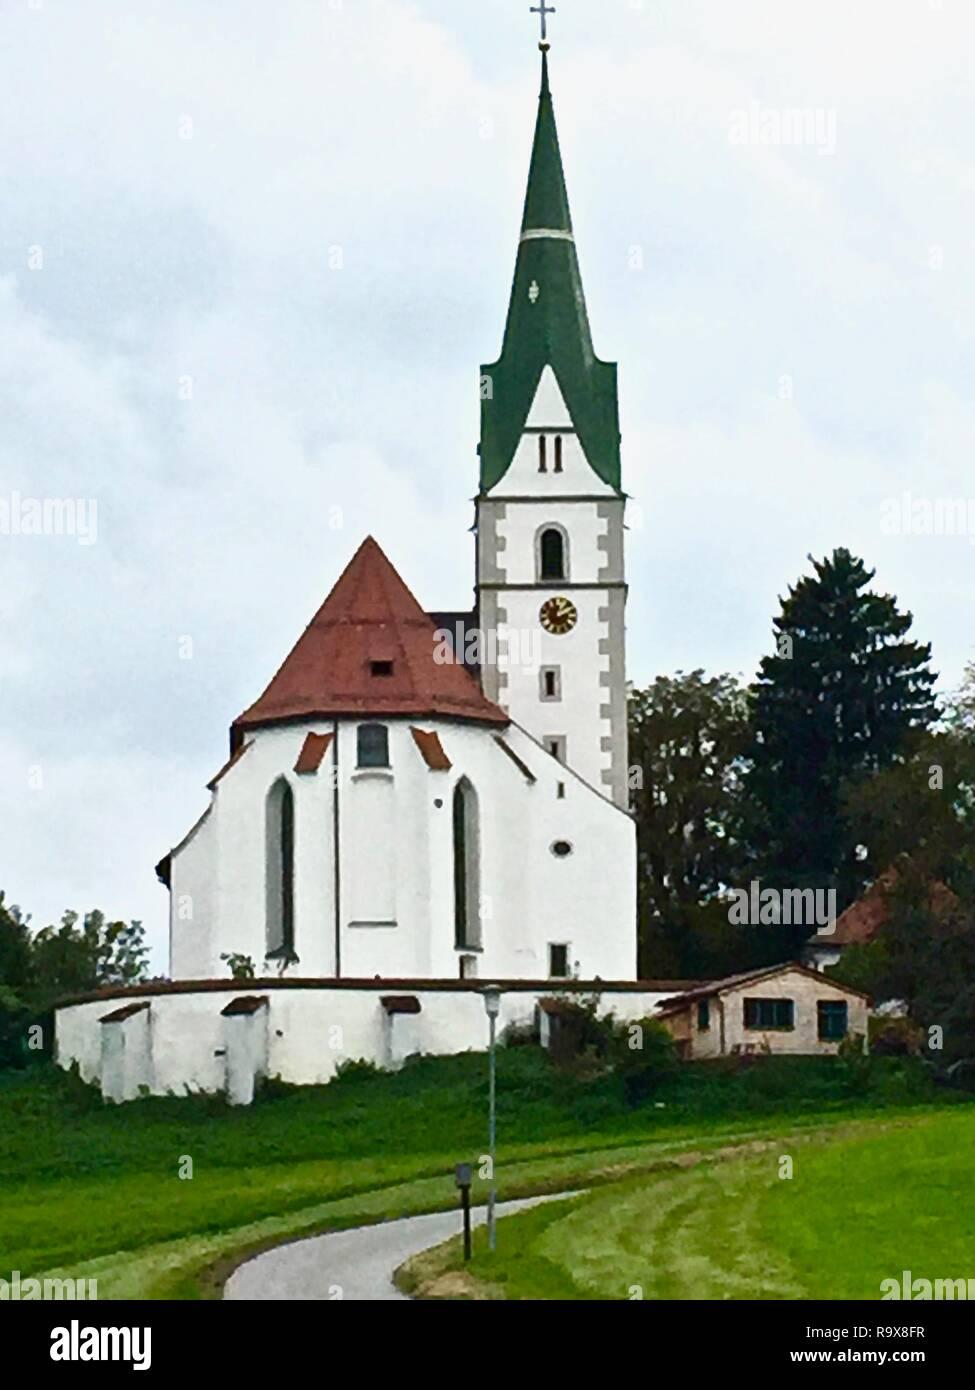 Weiss Kirche, Bavaria - Stock Image